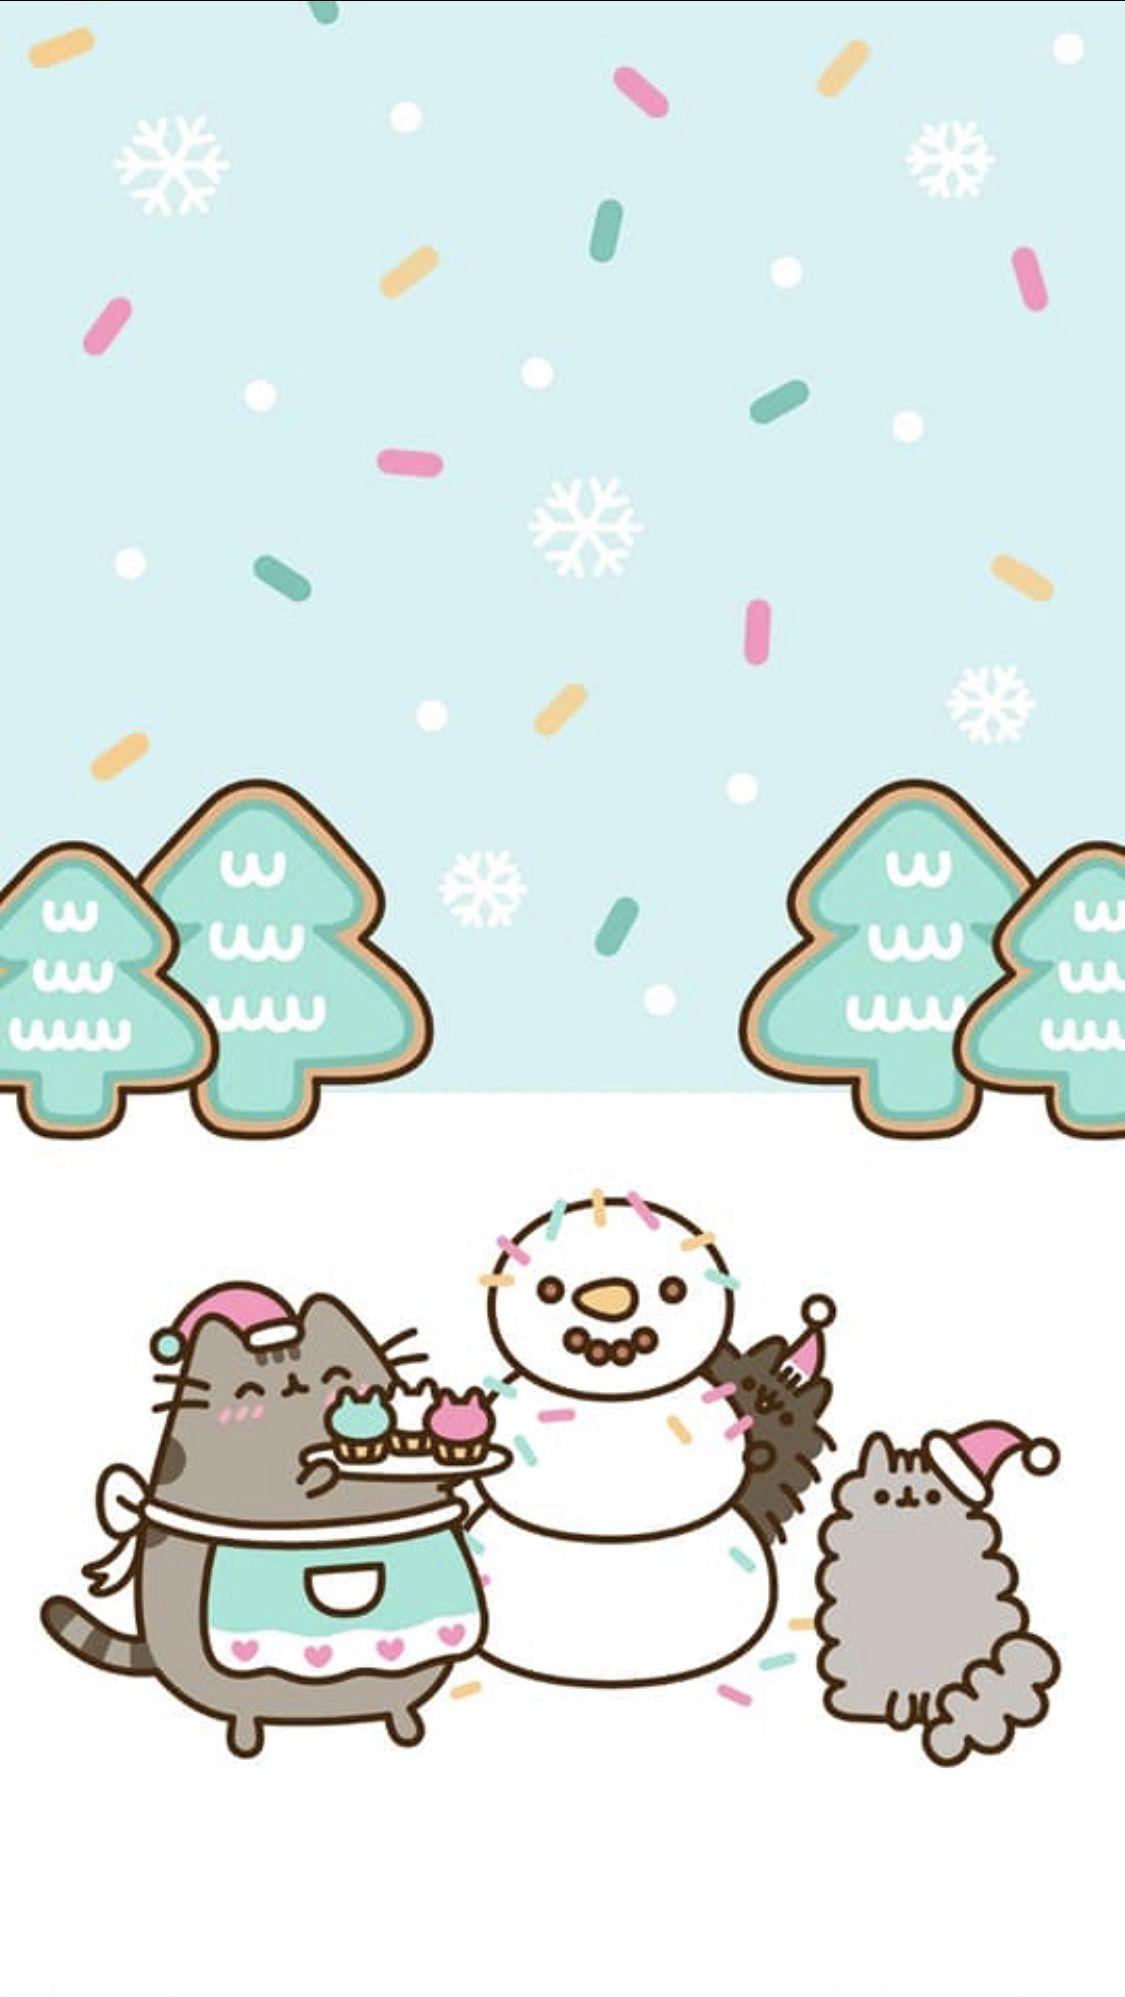 pusheen winter wallpaper !! (With images) Wallpaper